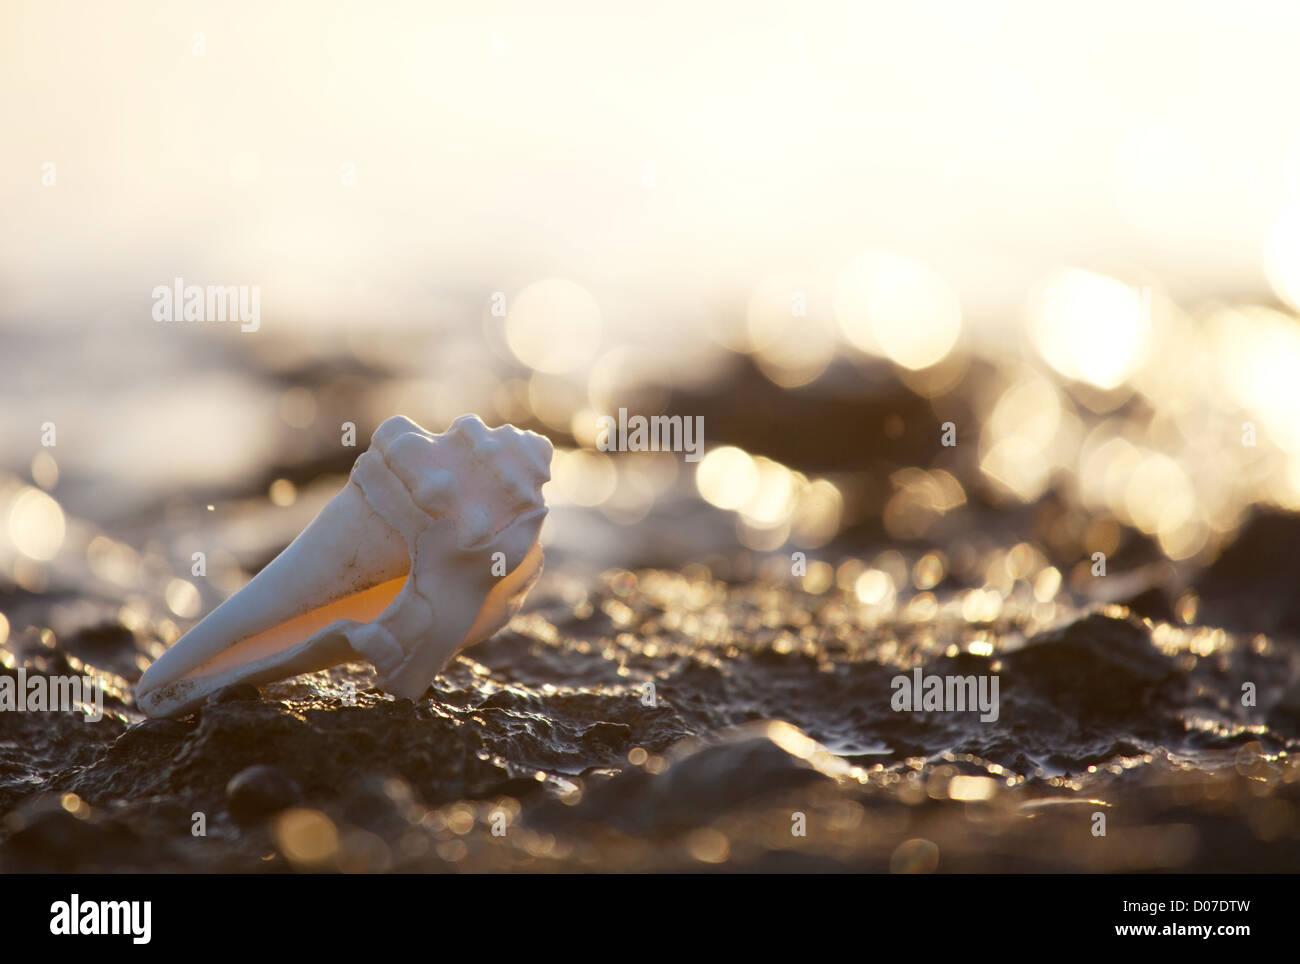 Shells - Stock Image